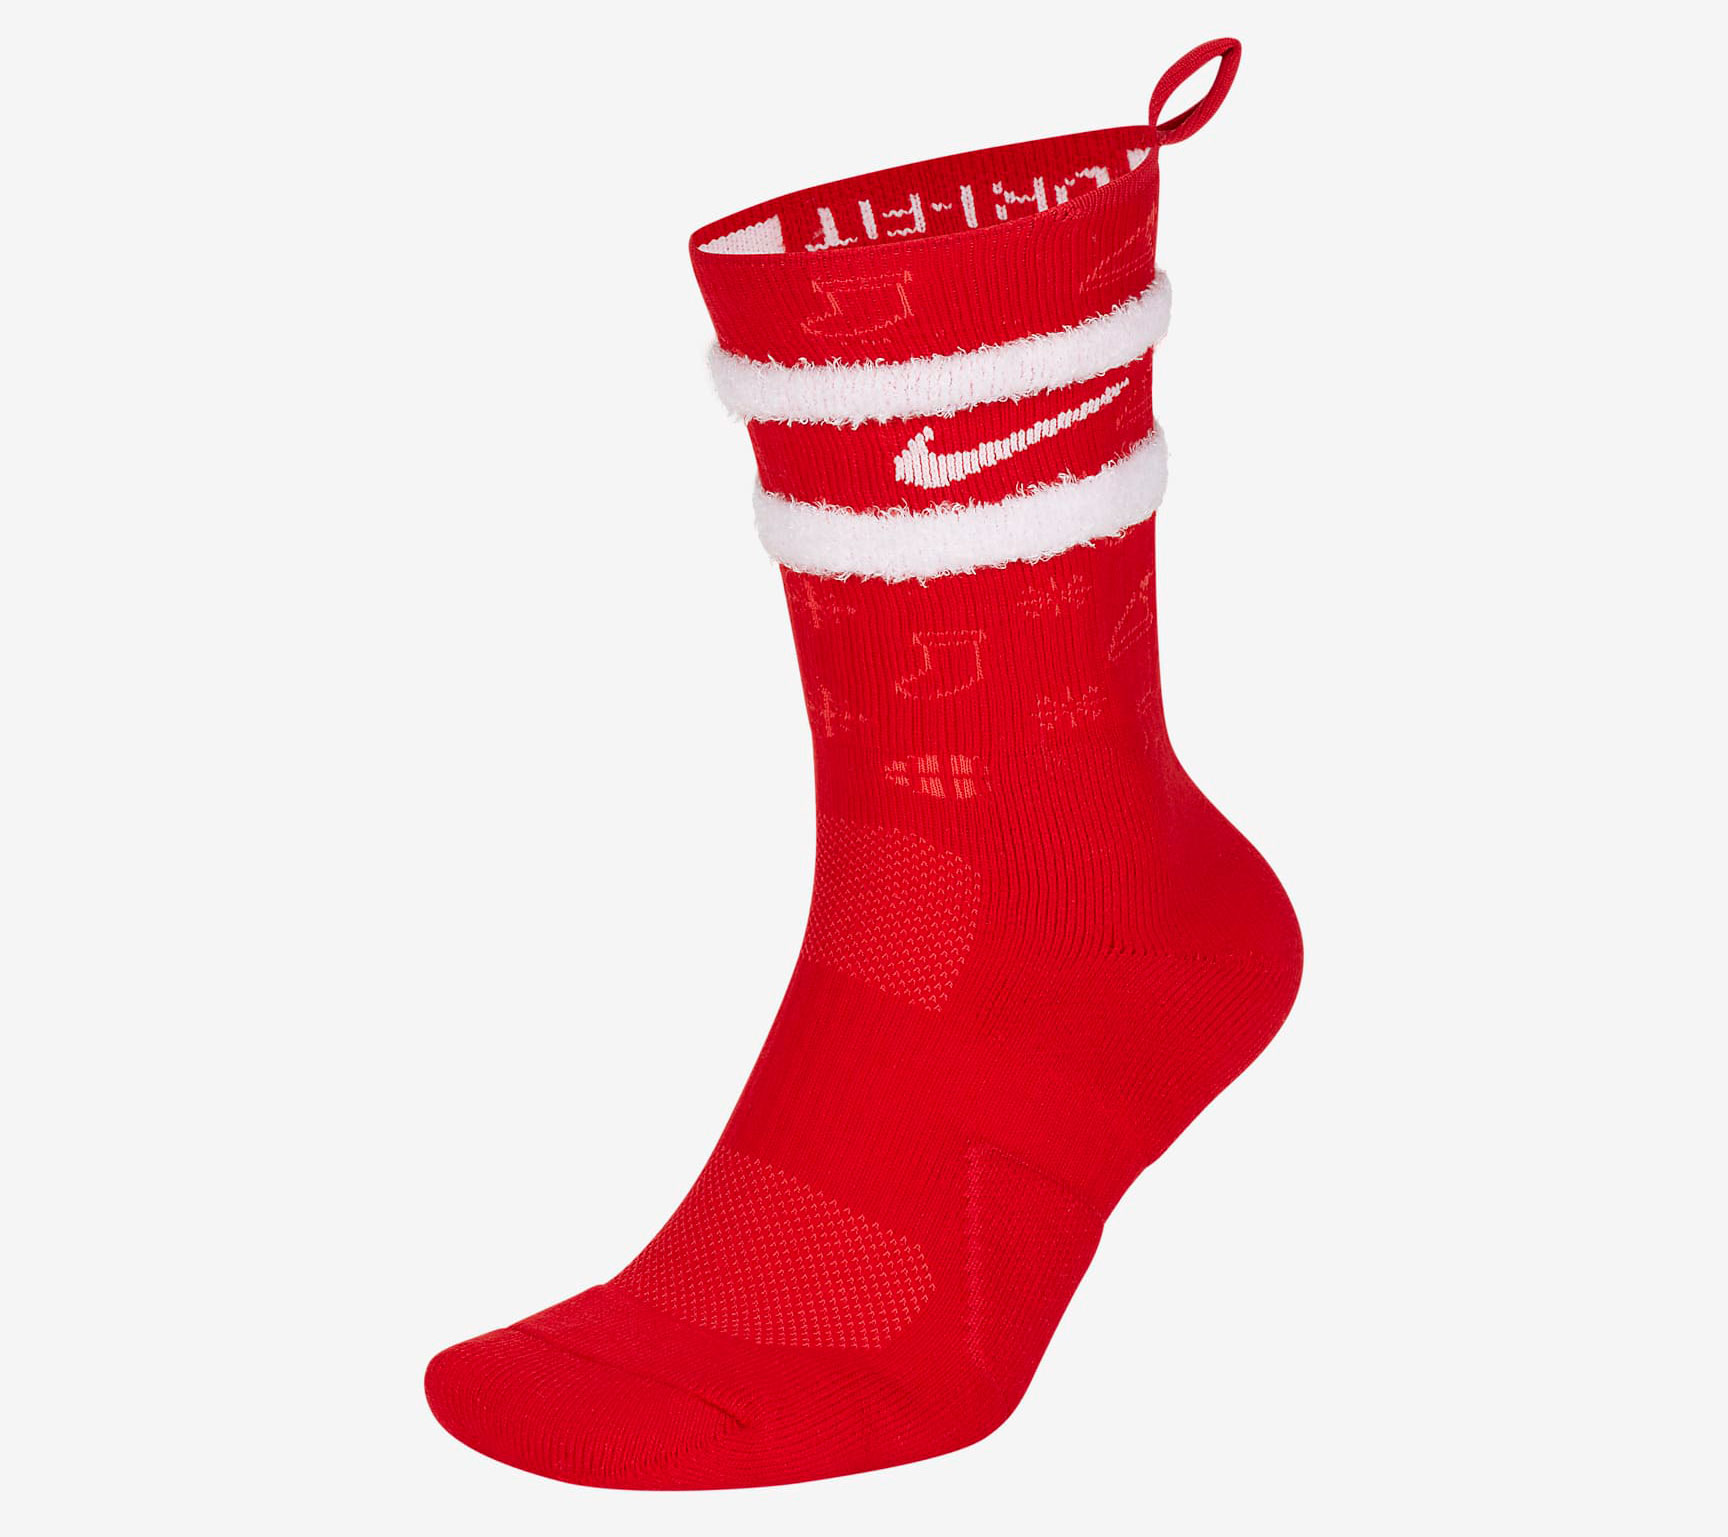 nike-elite-crew-christmas-socks-red